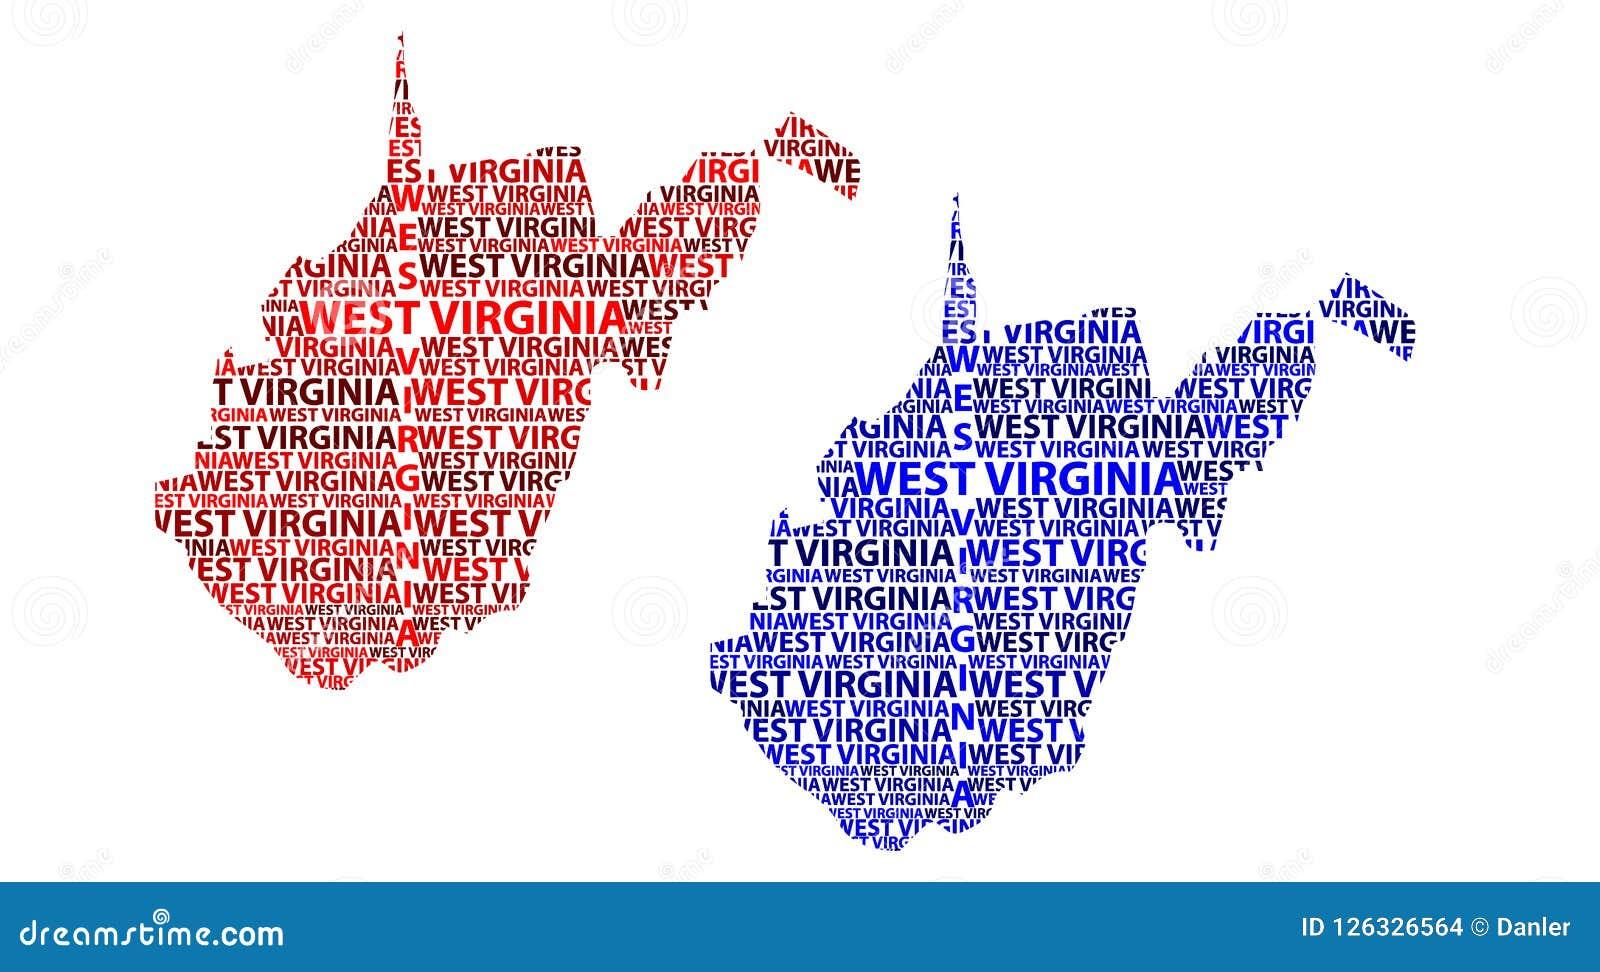 Map Of West Virginia - Vector Illustration Stock Vector ... Images Of West Virginia Us Map on state of west virginia, western pa map west virginia, atlas map of west virginia, detailed map west virginia, downloadable map of west virginia, west virginia and virginia, us maps with states and cities west virginia,